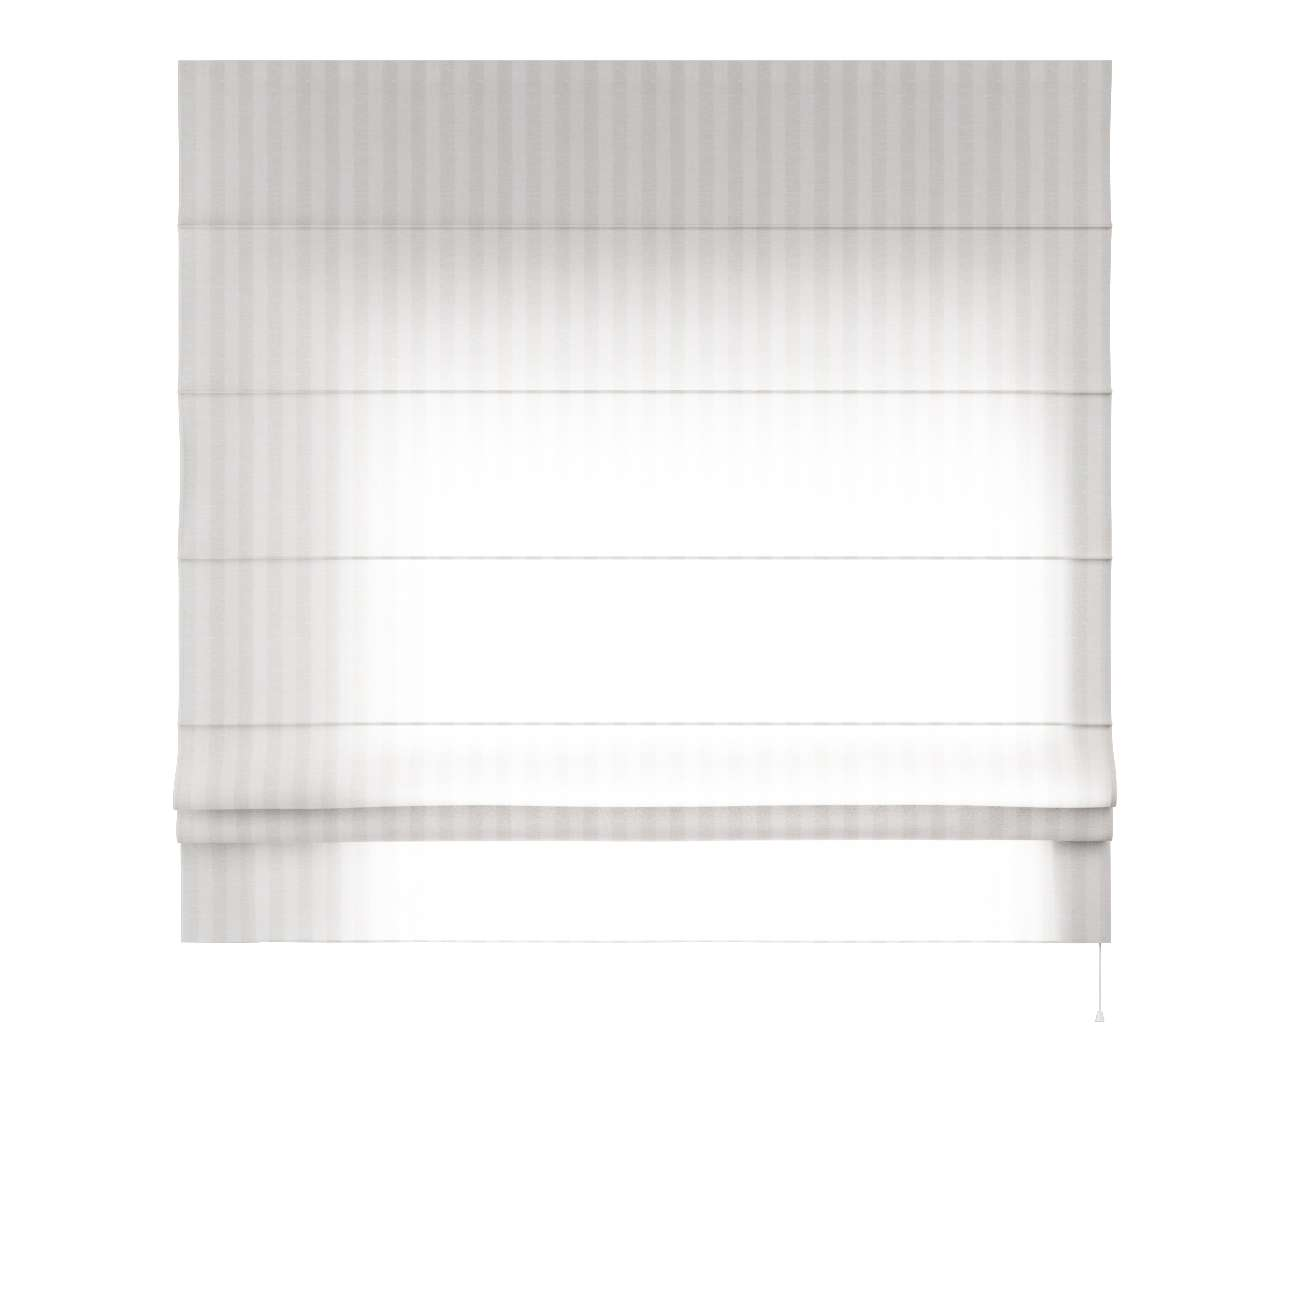 Foldegardin Paris<br/>Med lige flæse 80 x 170 cm fra kollektionen Linen, Stof: 392-03